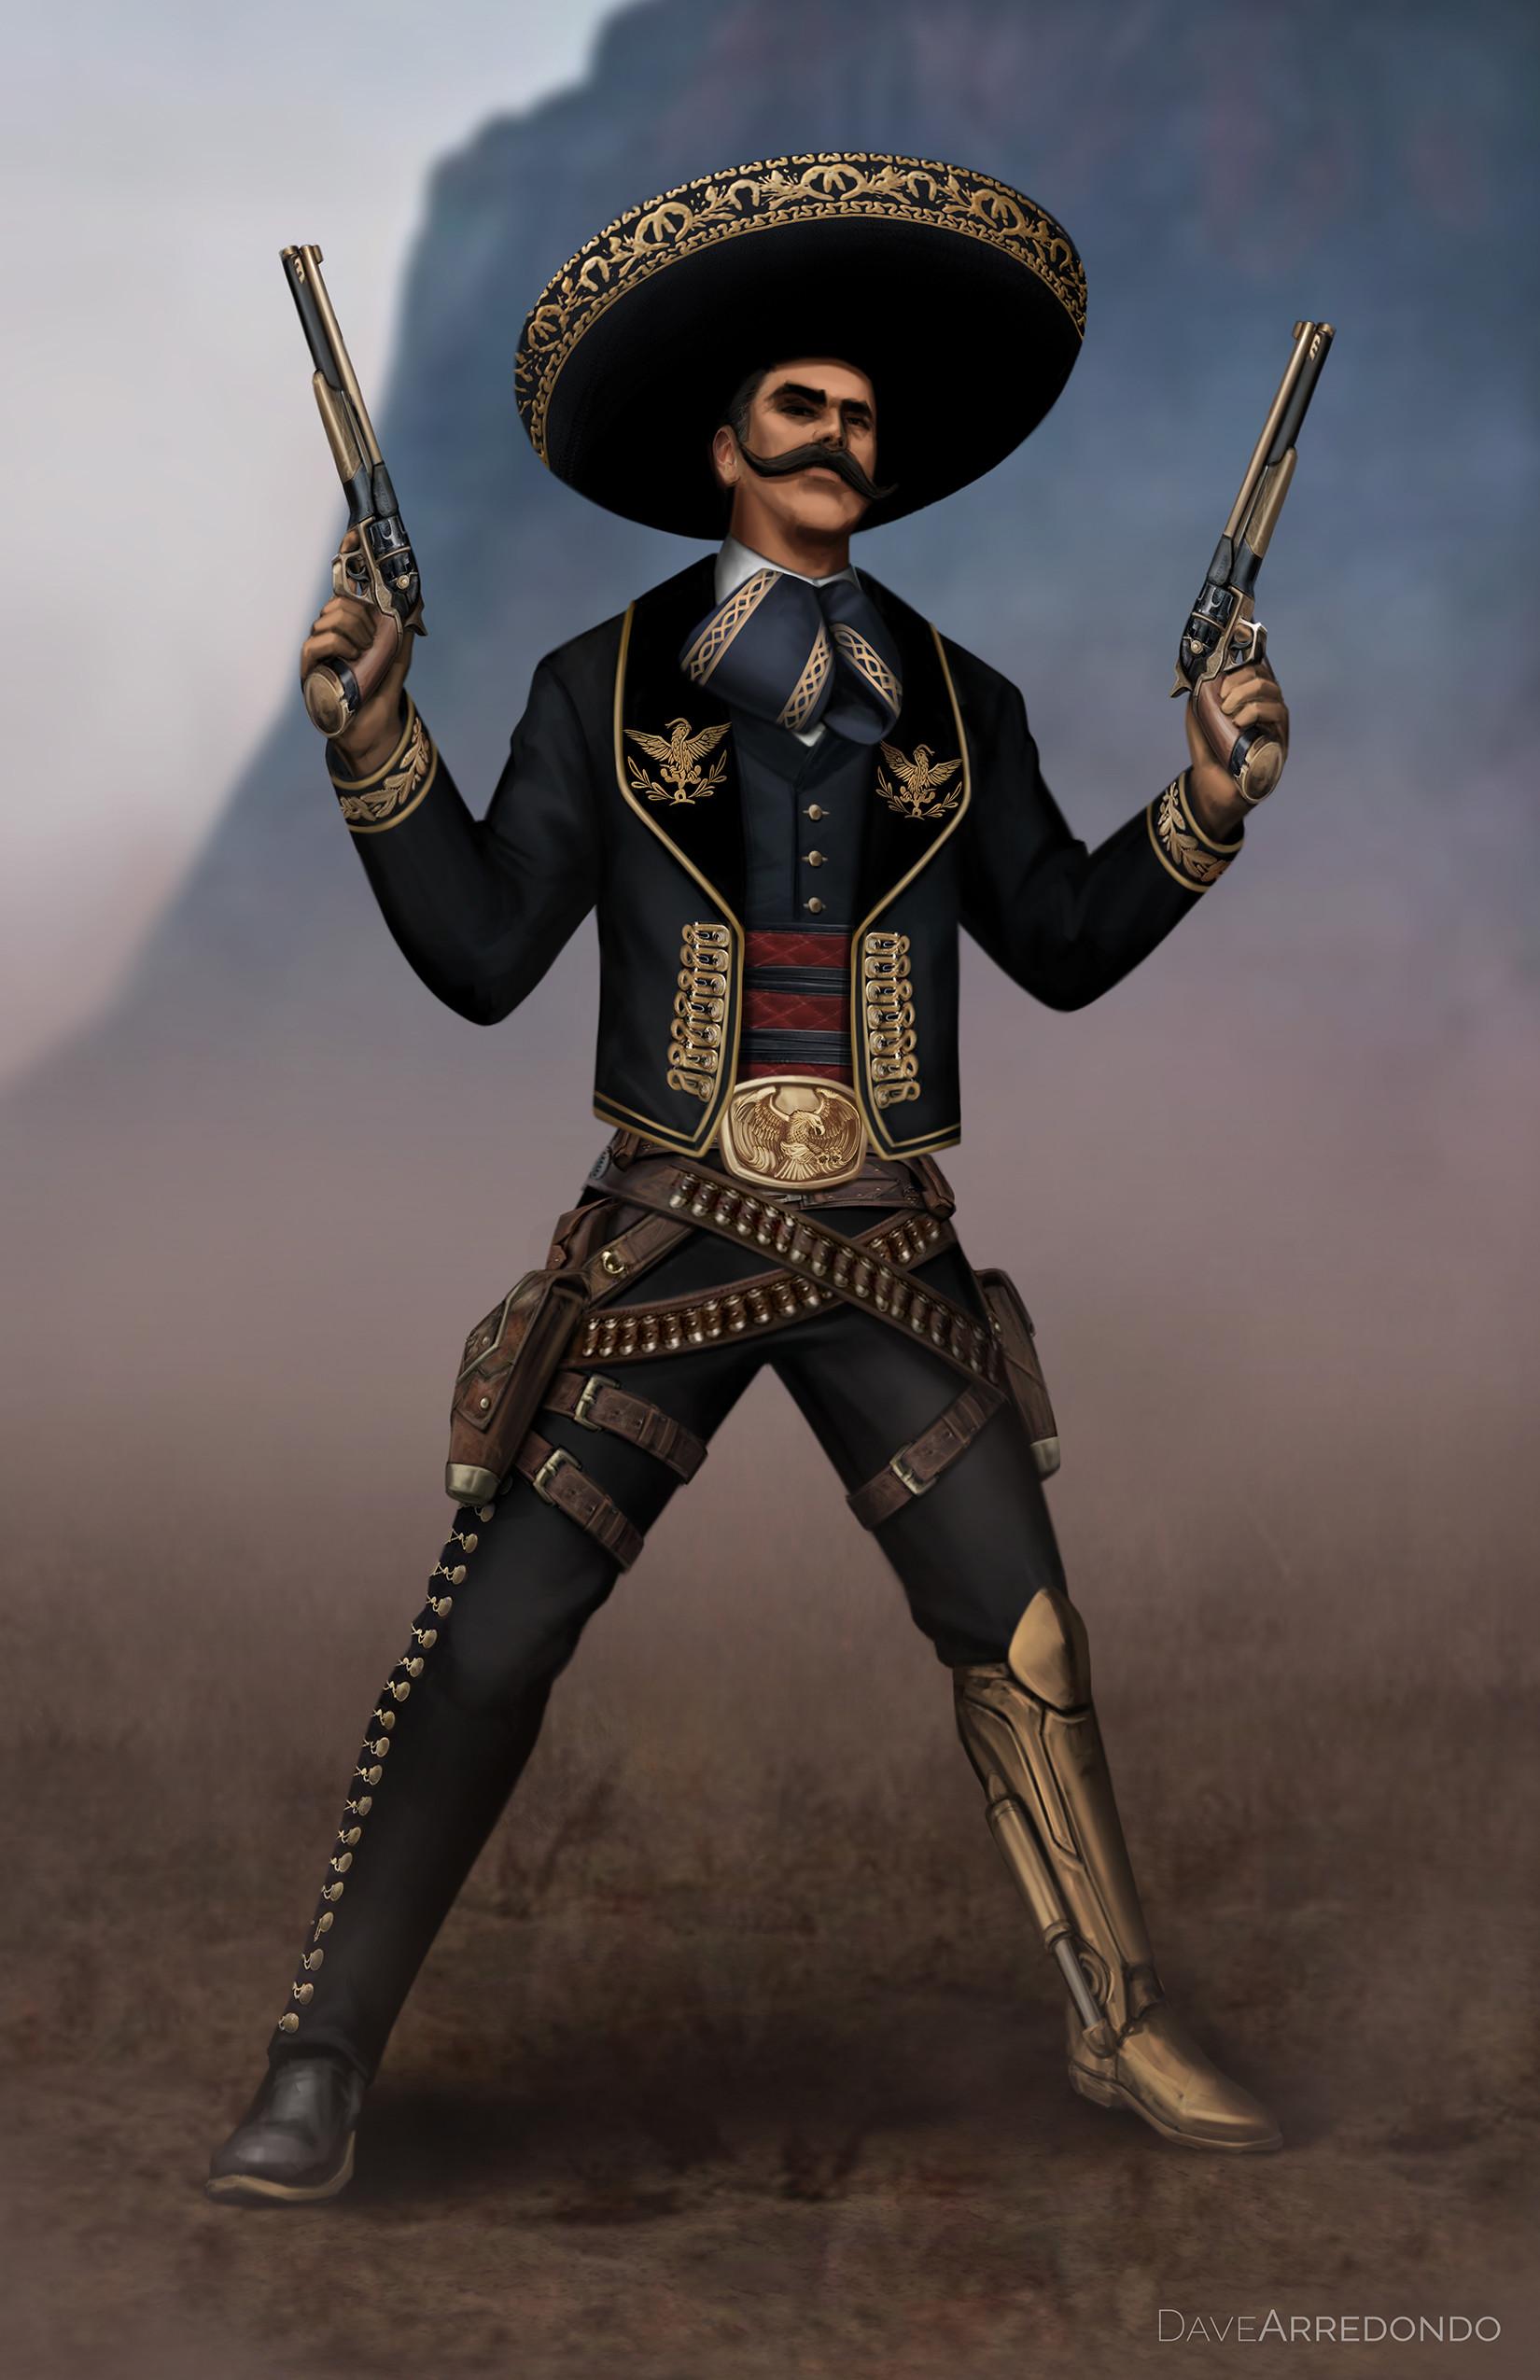 Dave arredondo dave arredondo wildwest gunslingers panchitorevolver